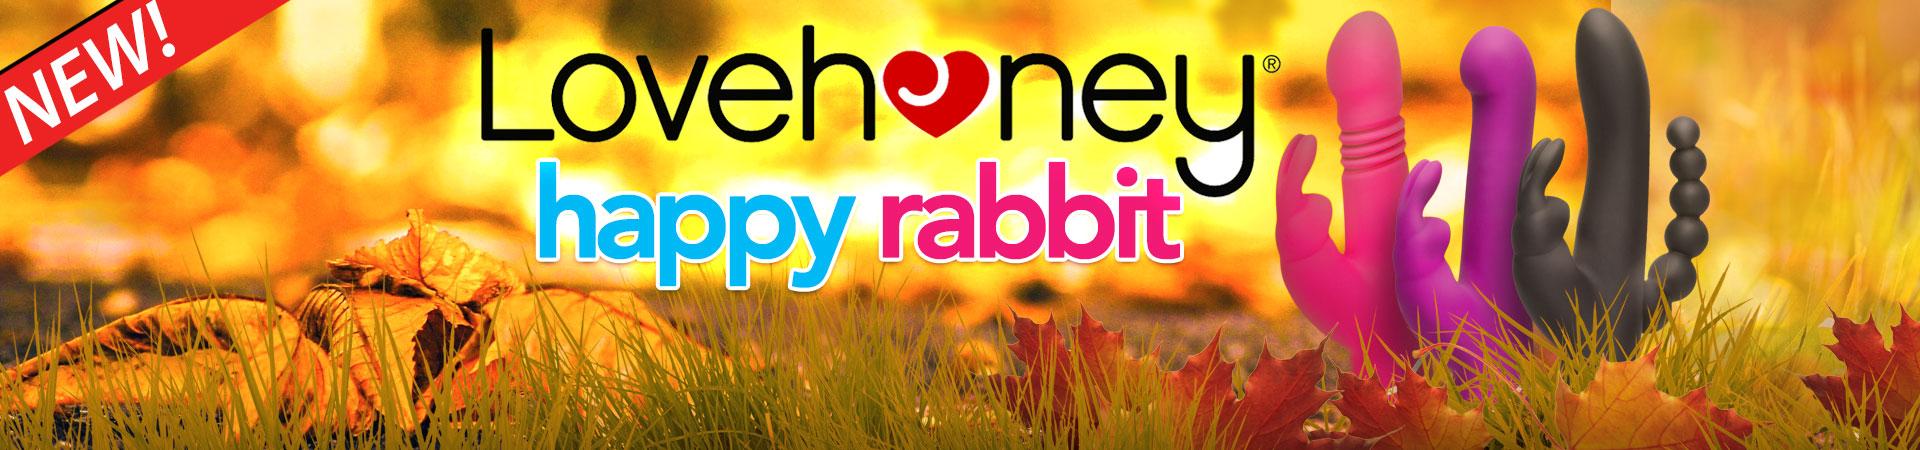 New Dual Stimulation Happy Rabbit Vibes From Lovehoney